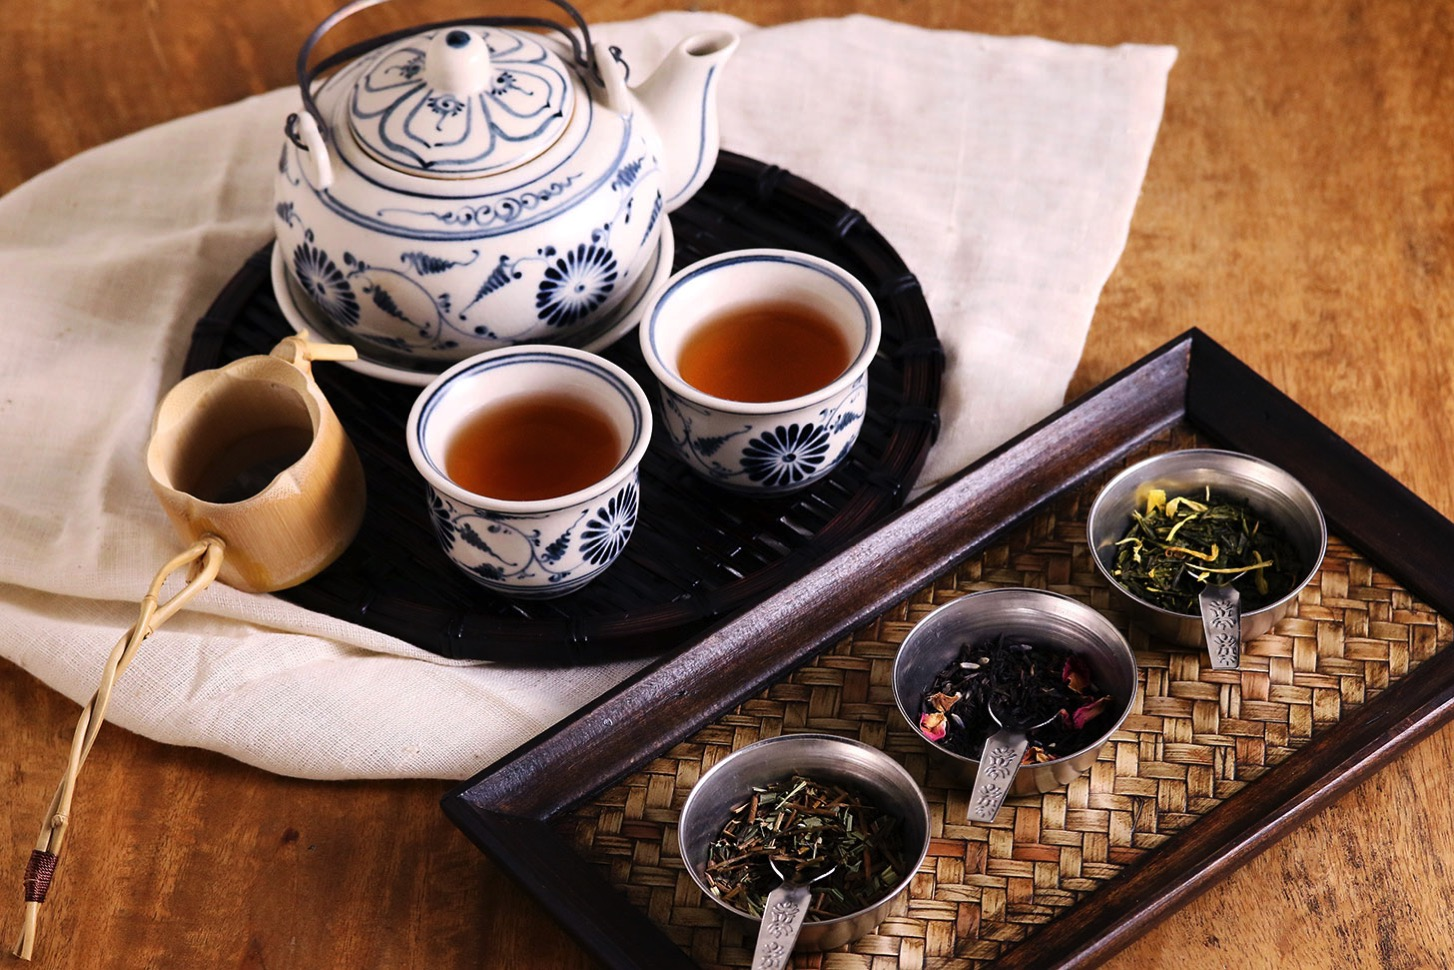 HASU(ハス)のお茶